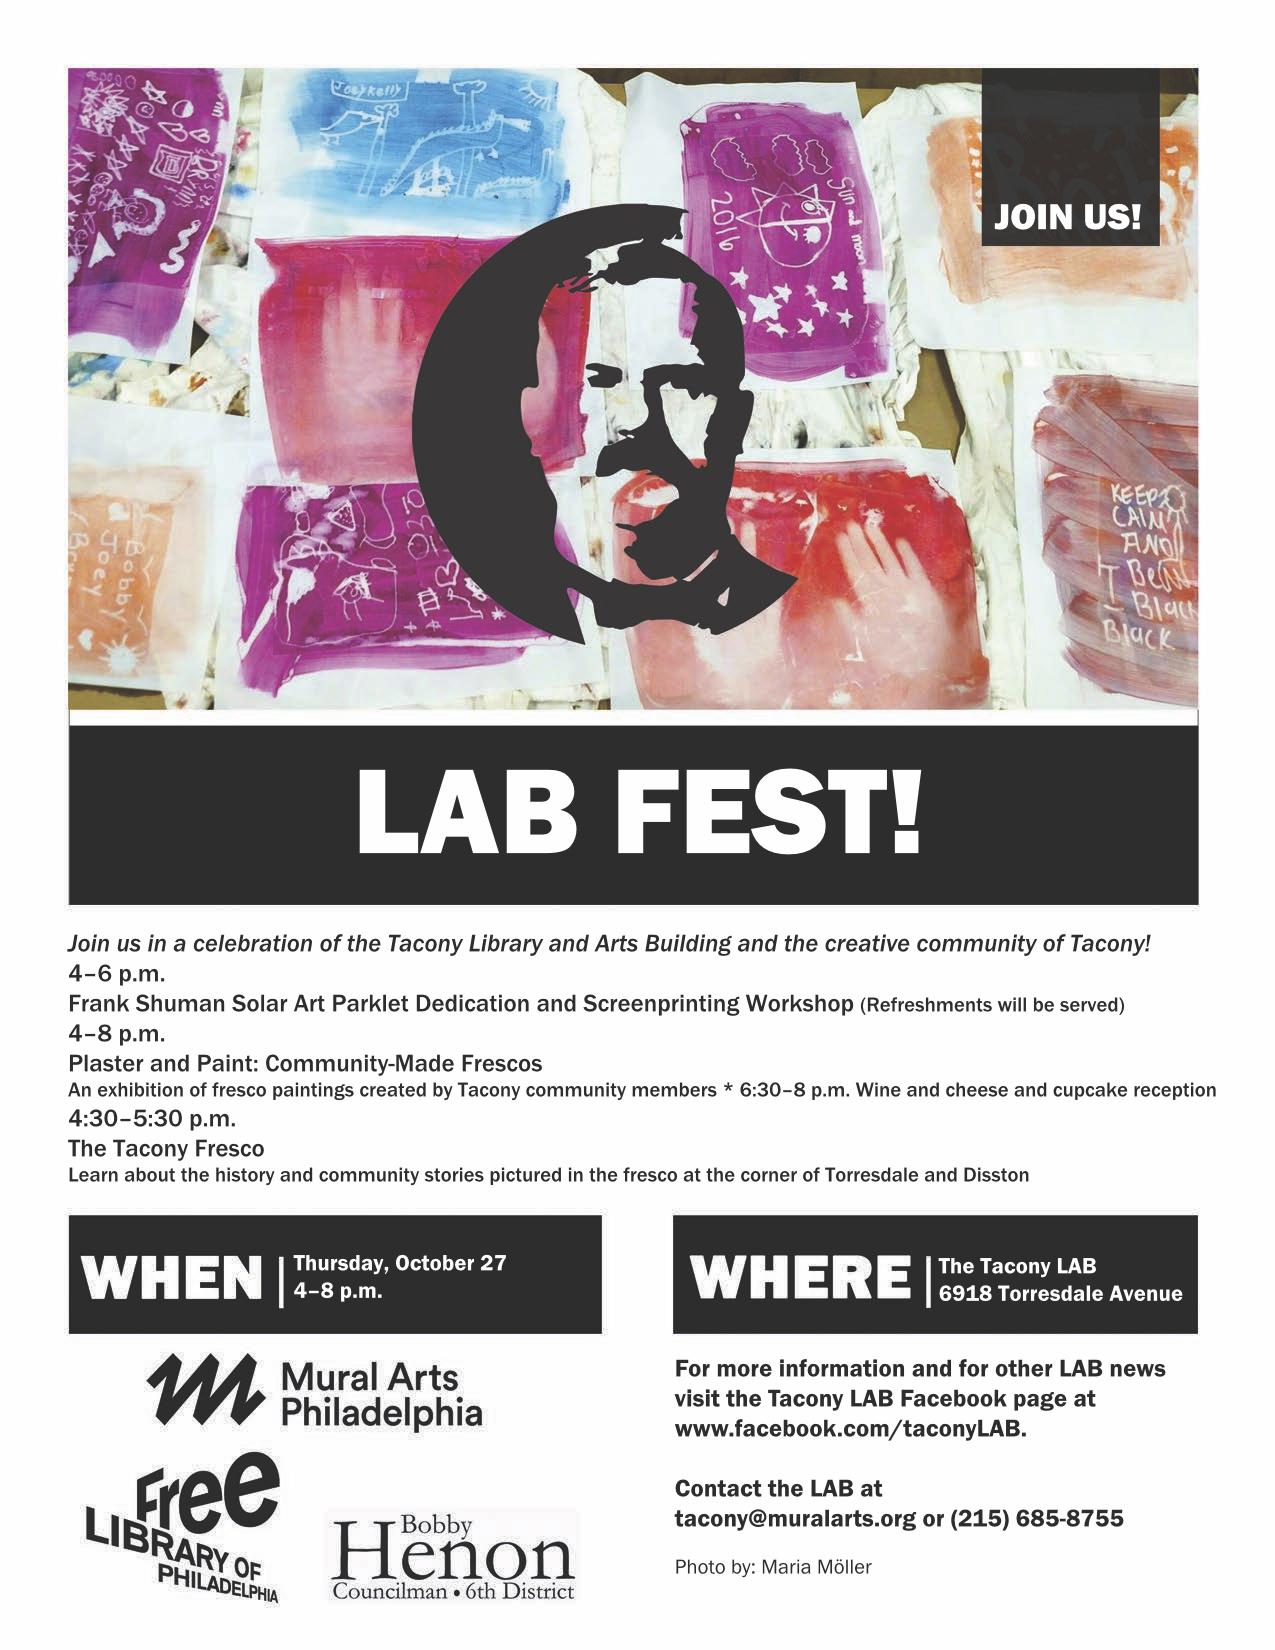 LAB_Fest_Flyer.jpg